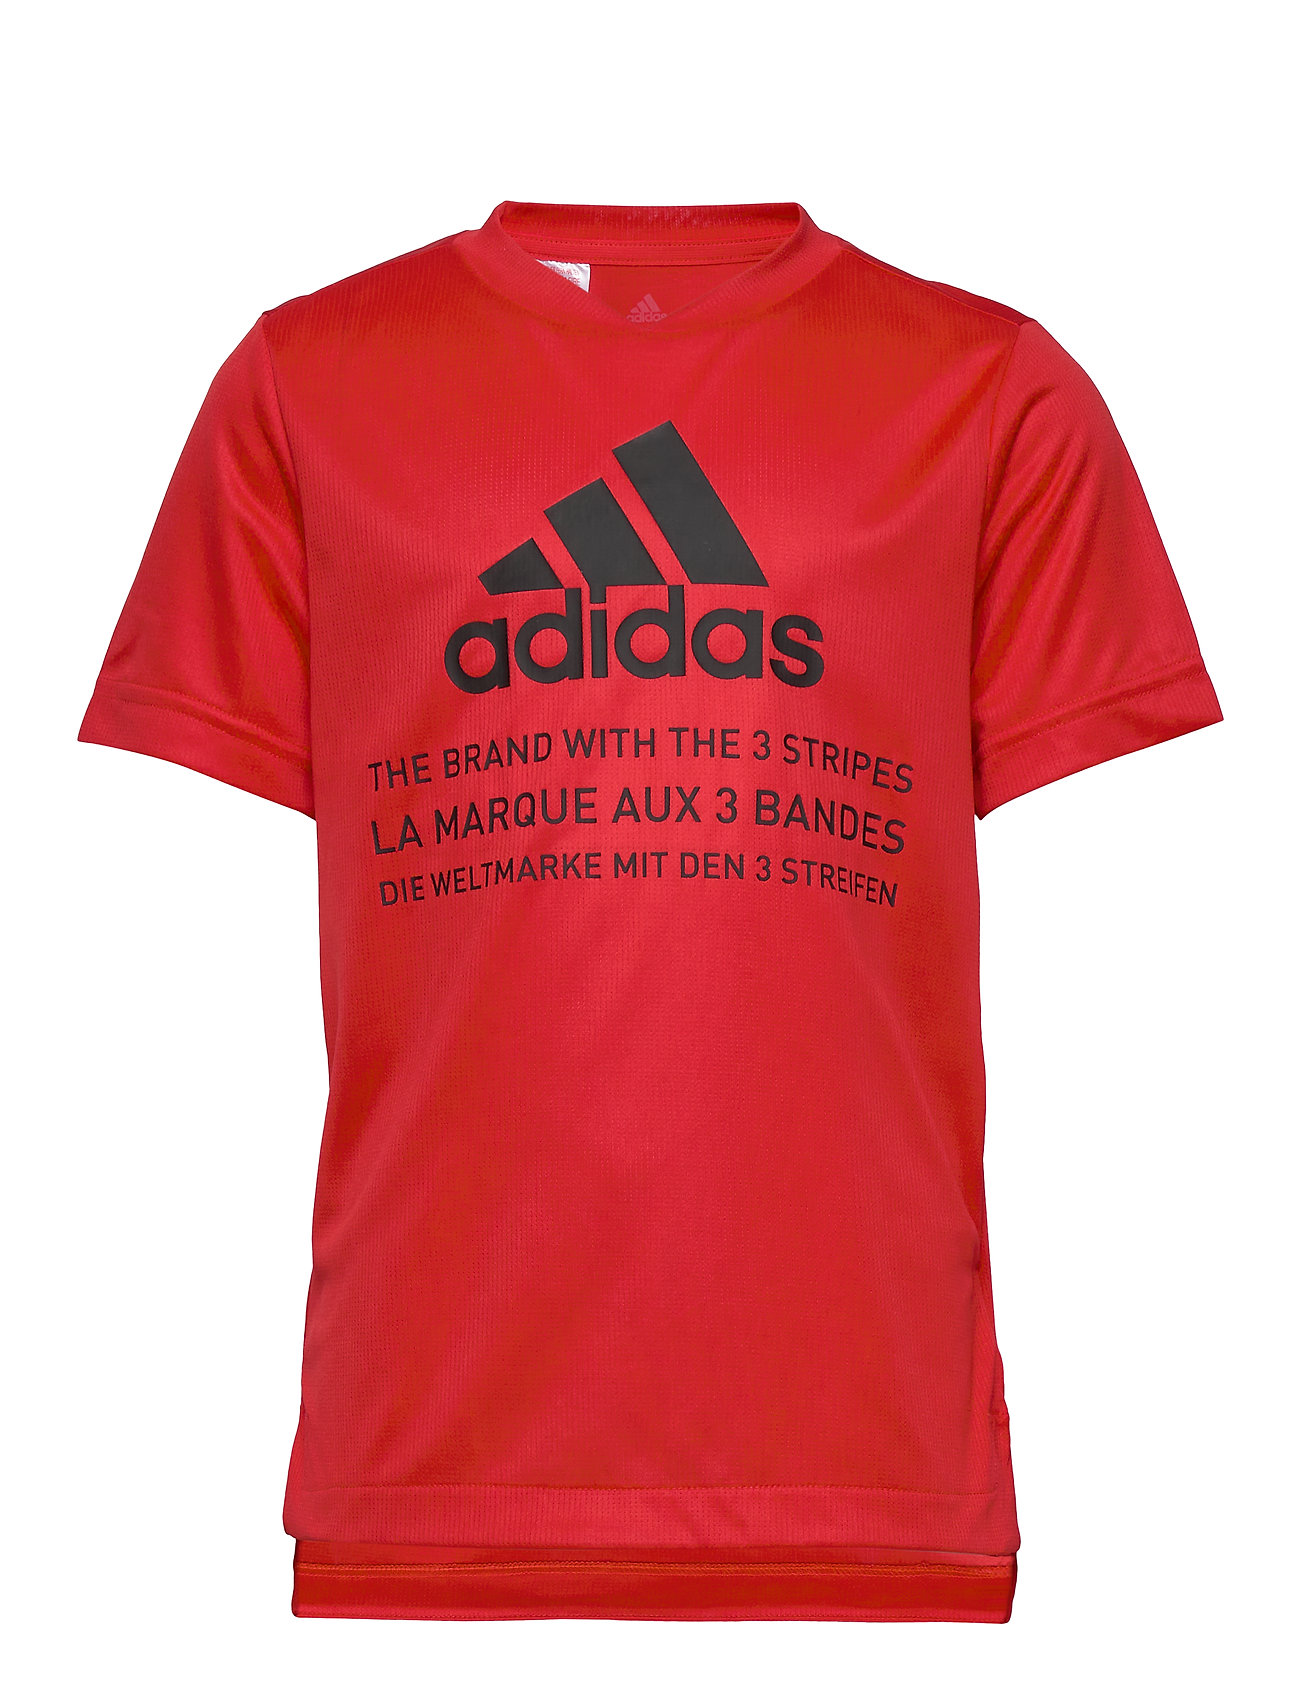 Image of Jb Tr Tee V1 T-shirt Rød Adidas Performance (3419554279)